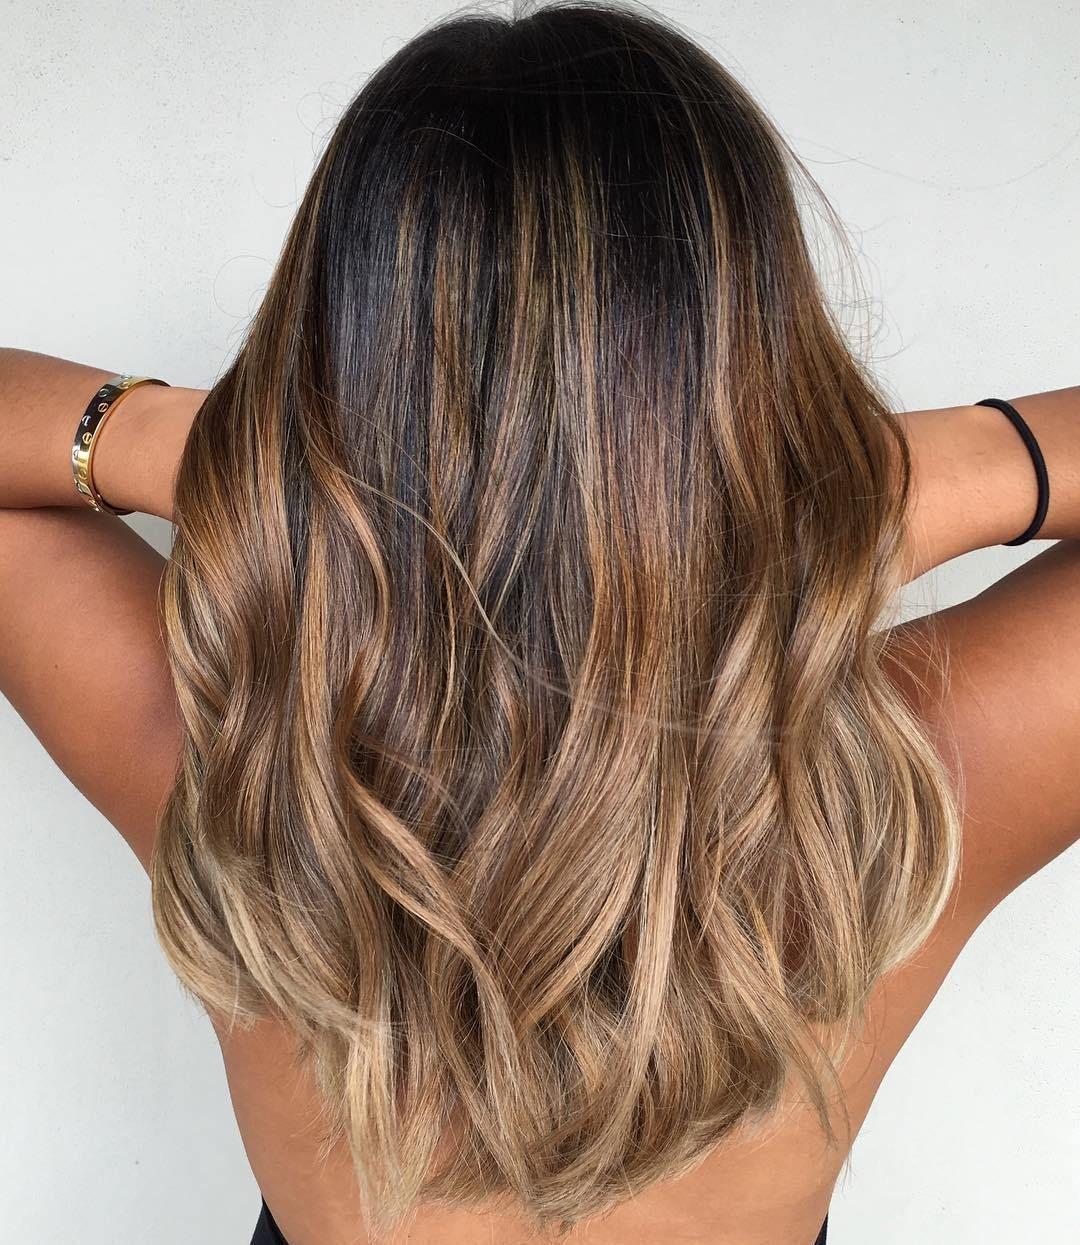 Tips on how to maintain balayage hair